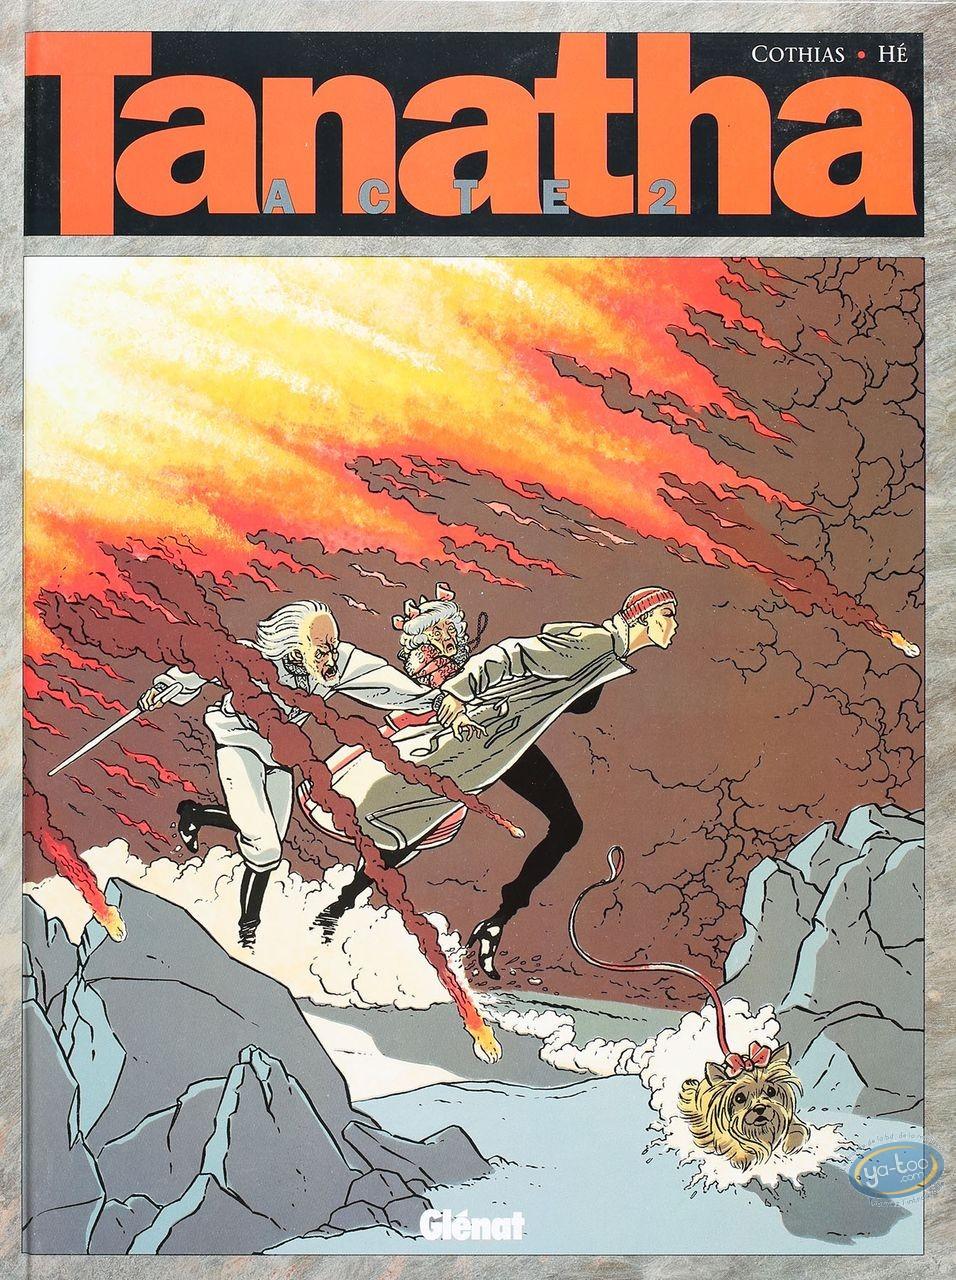 Listed European Comic Books, Tanatha : Acte 2 (very good condition)